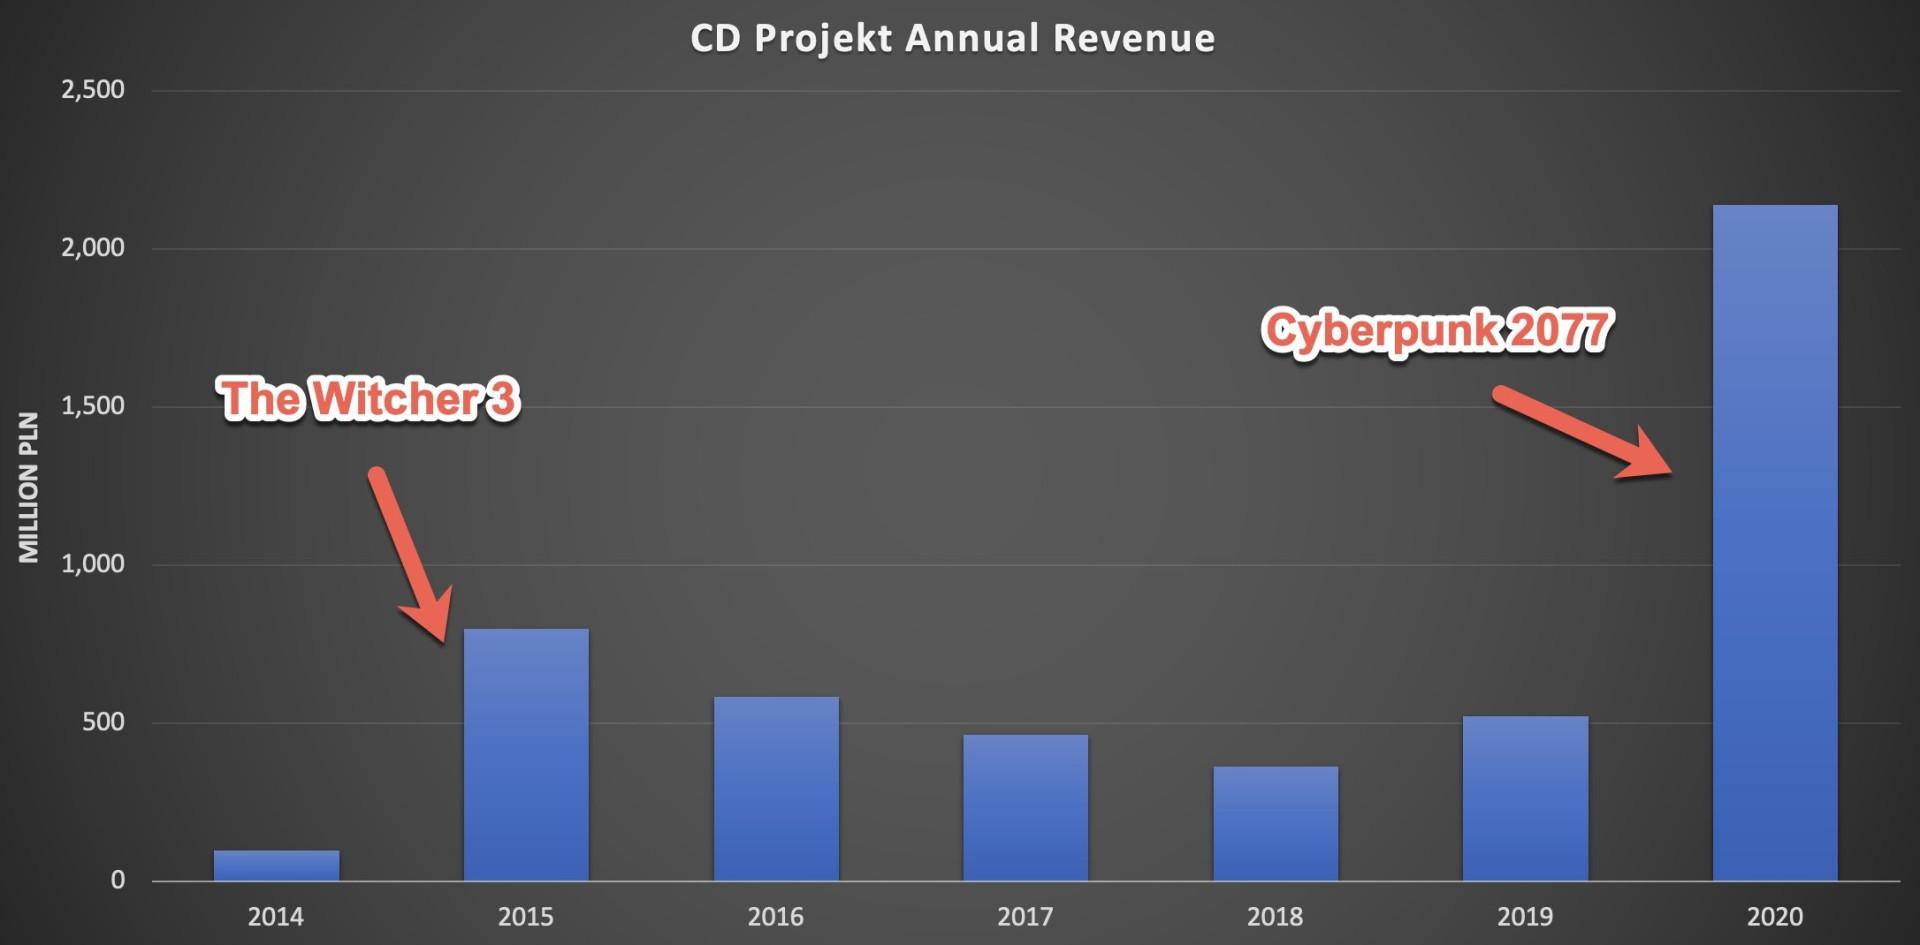 3DM速报:CDP去年营收36.7亿创纪录,生化危机8佣兵模式确认回归